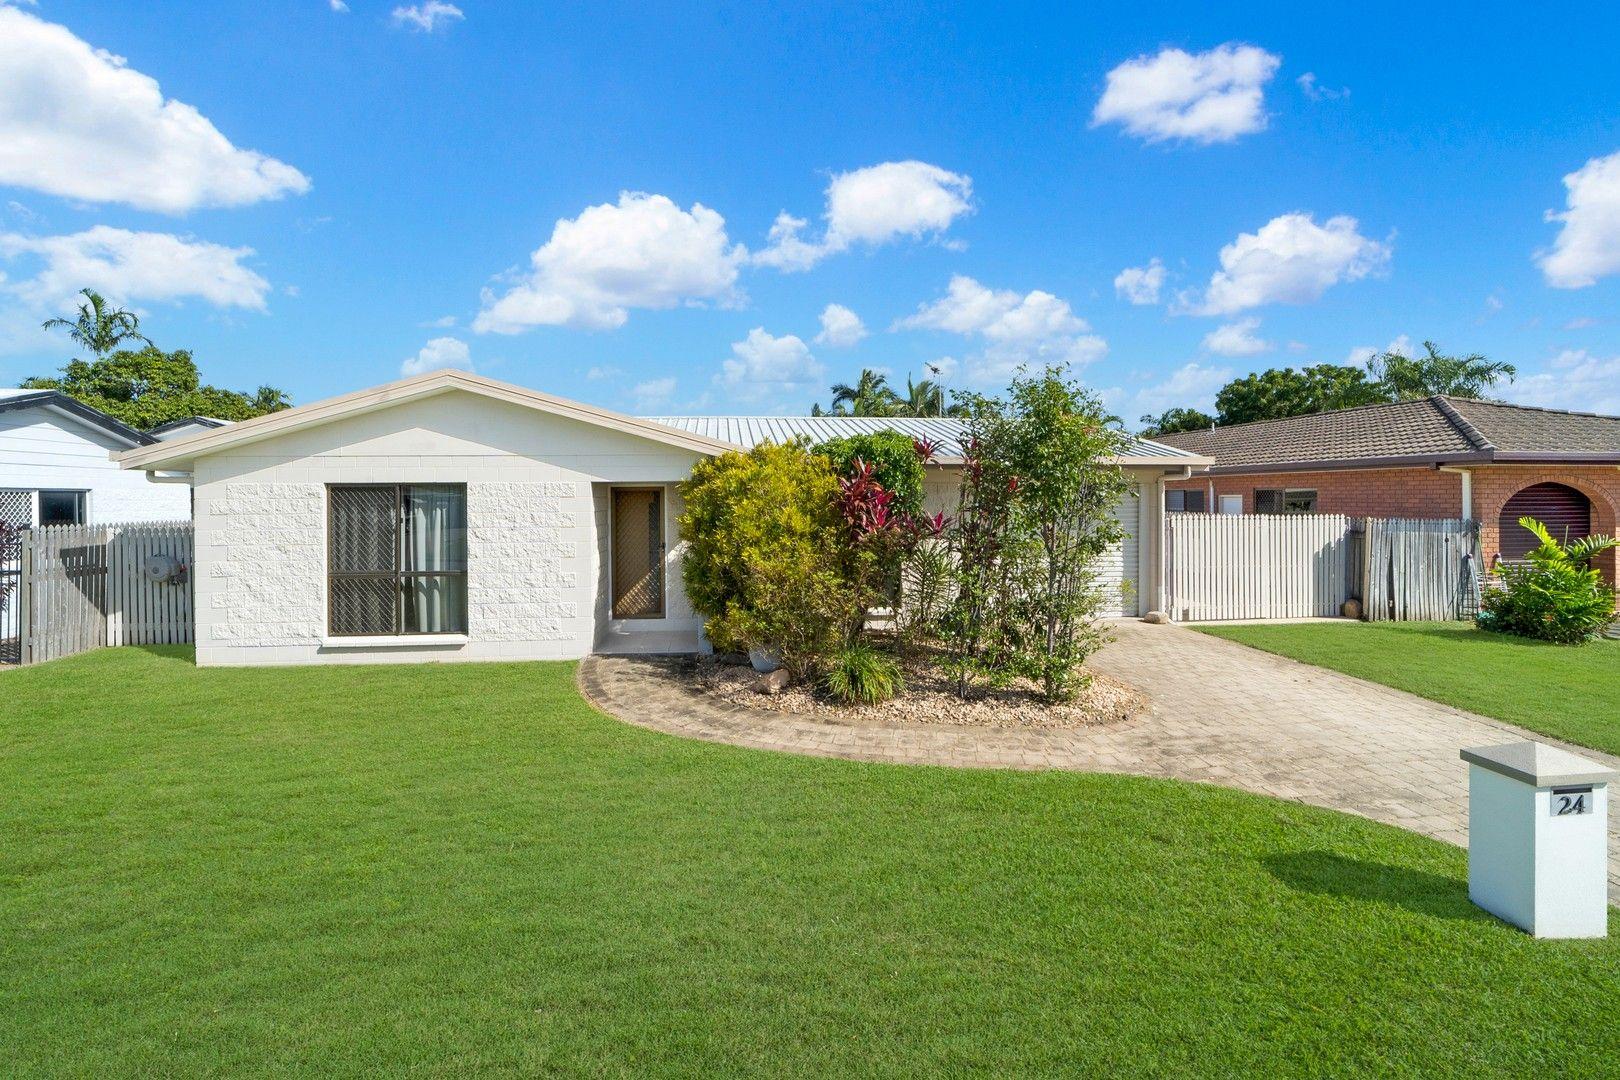 24 Raintree Way, Thuringowa Central QLD 4817, Image 0